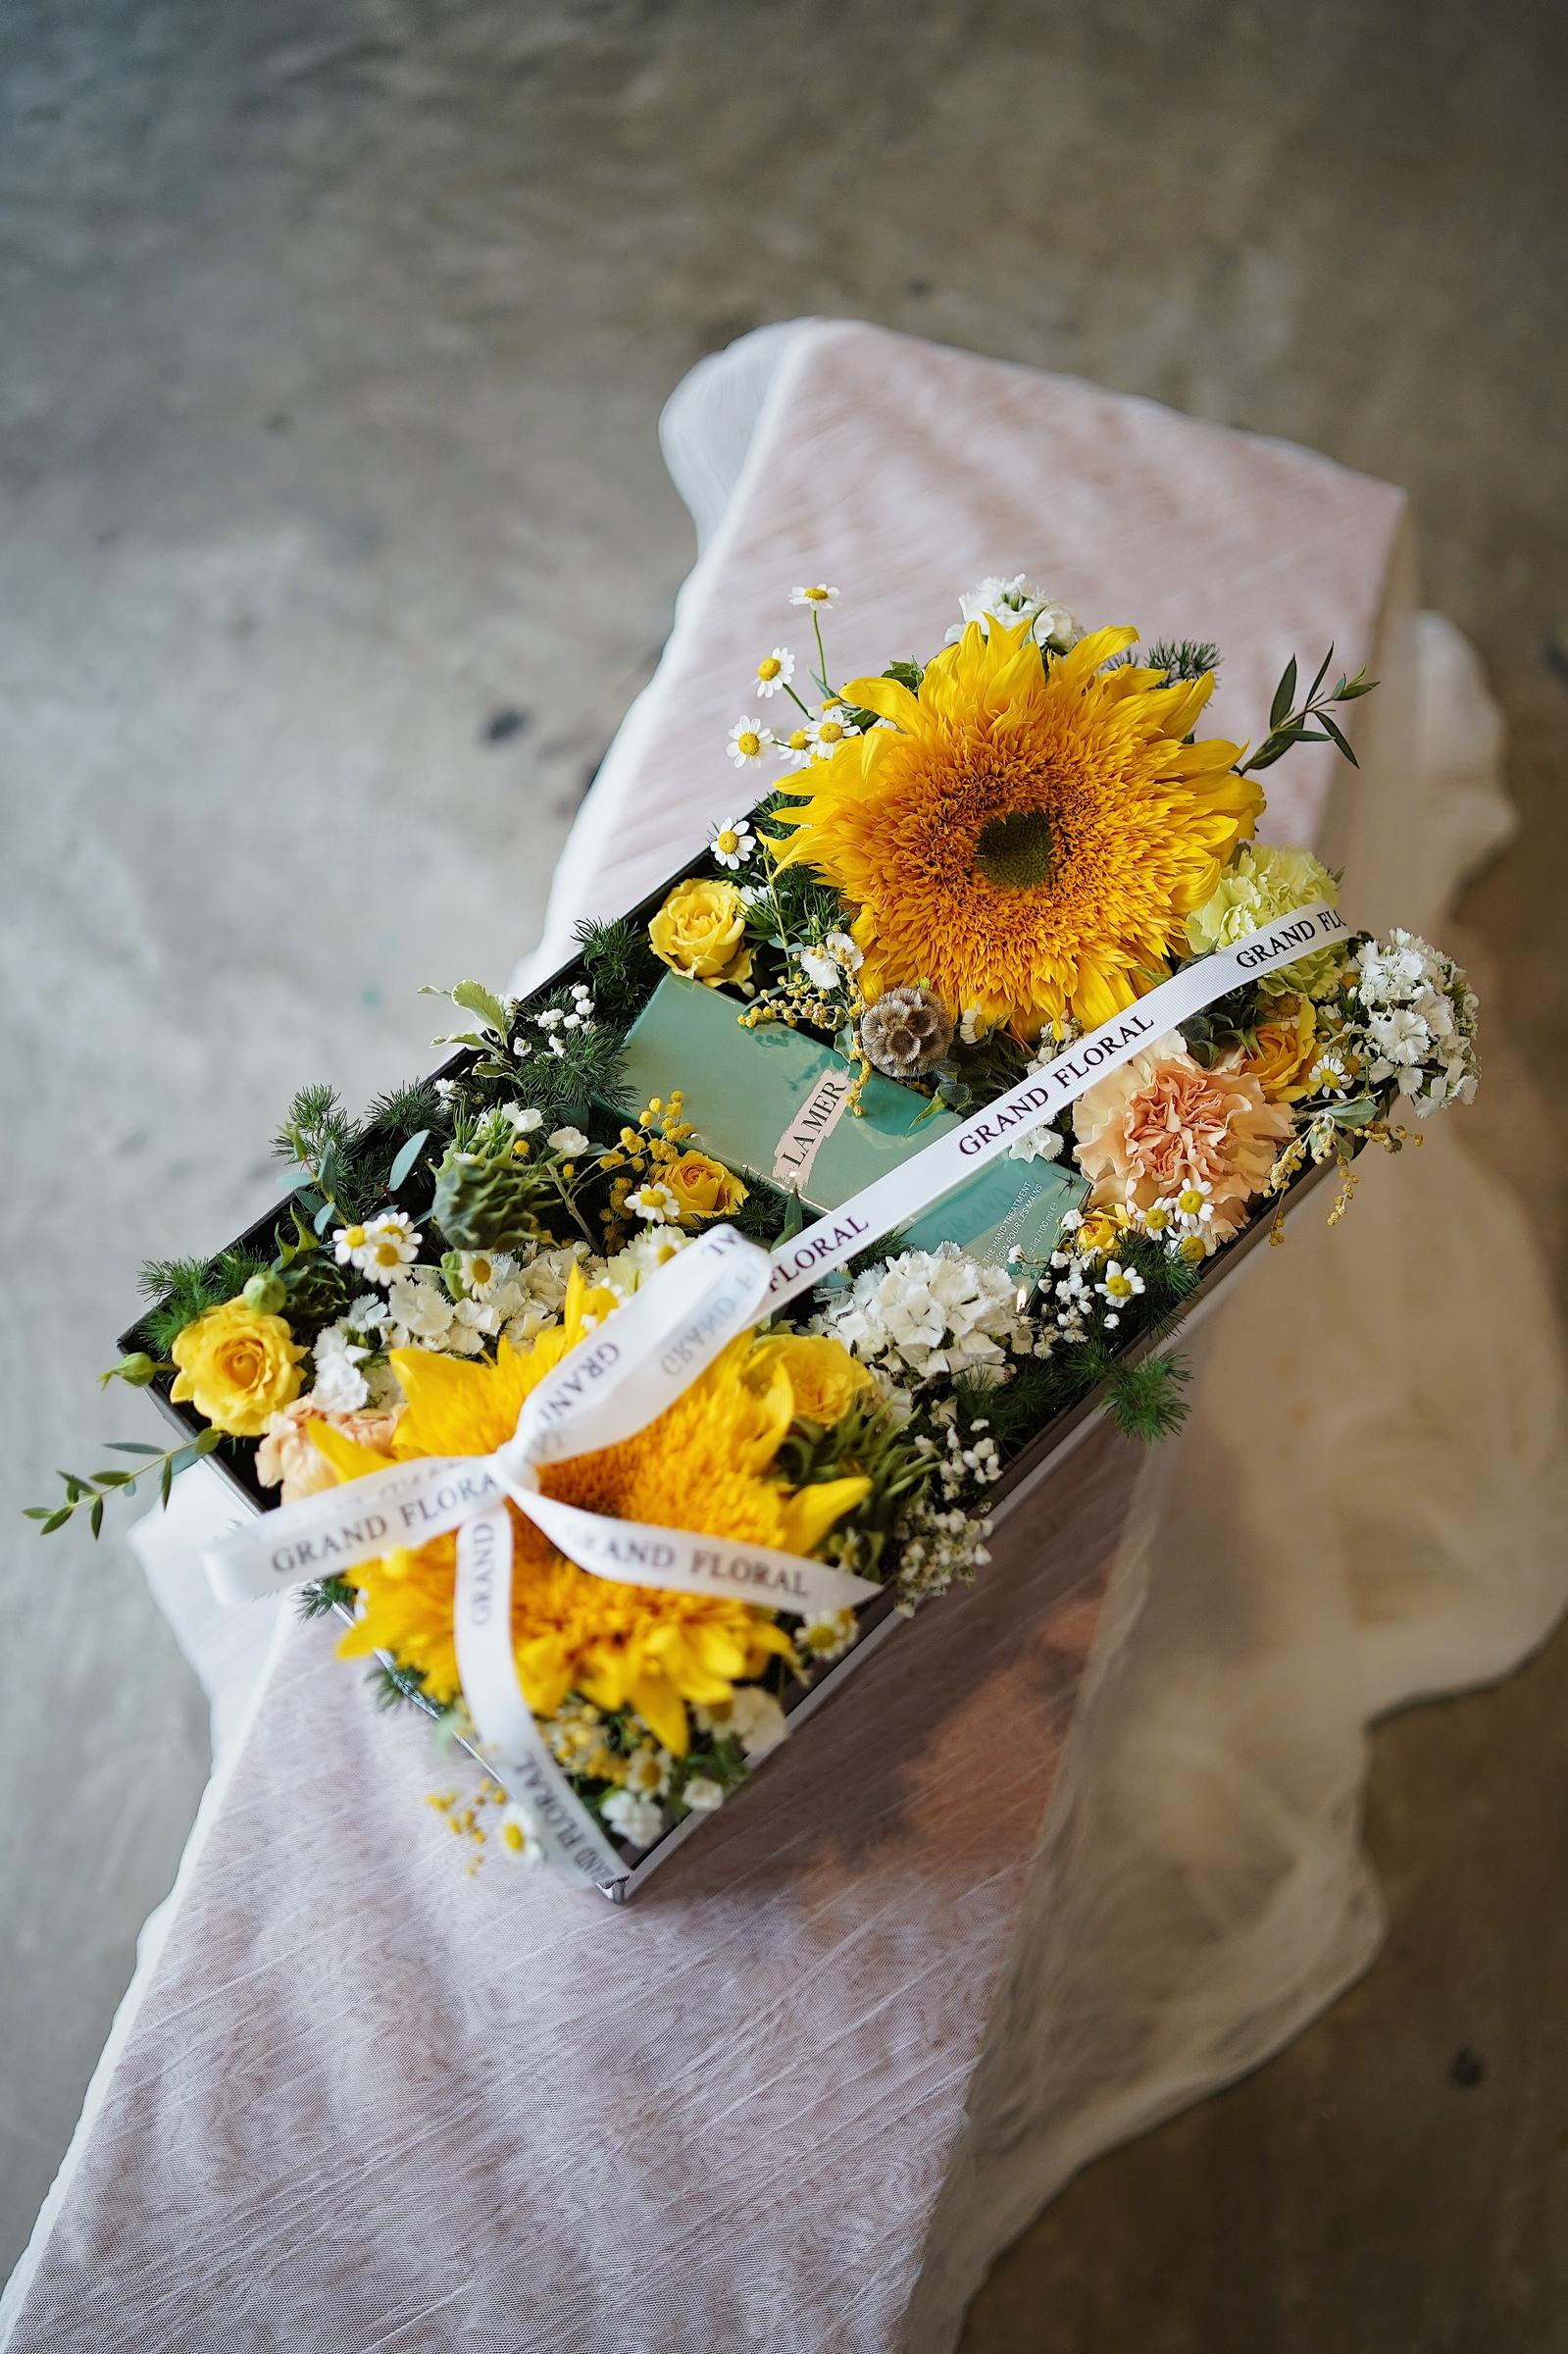 Grand Floral Art Studio |  - FLOWER BOX